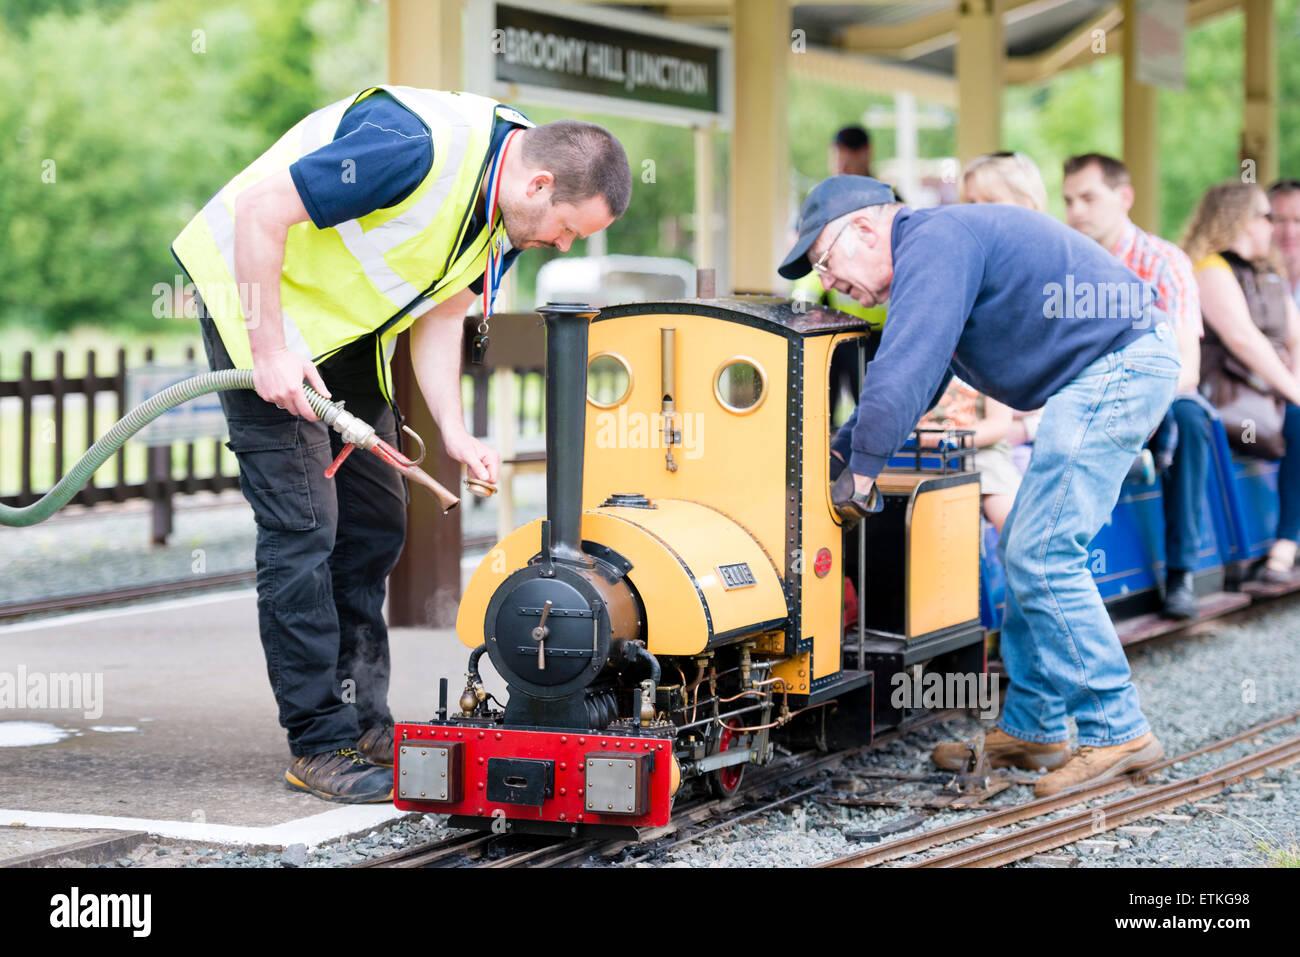 Hereford Society of Model Engineers 5' gauge miniature steam railway. - Stock Image